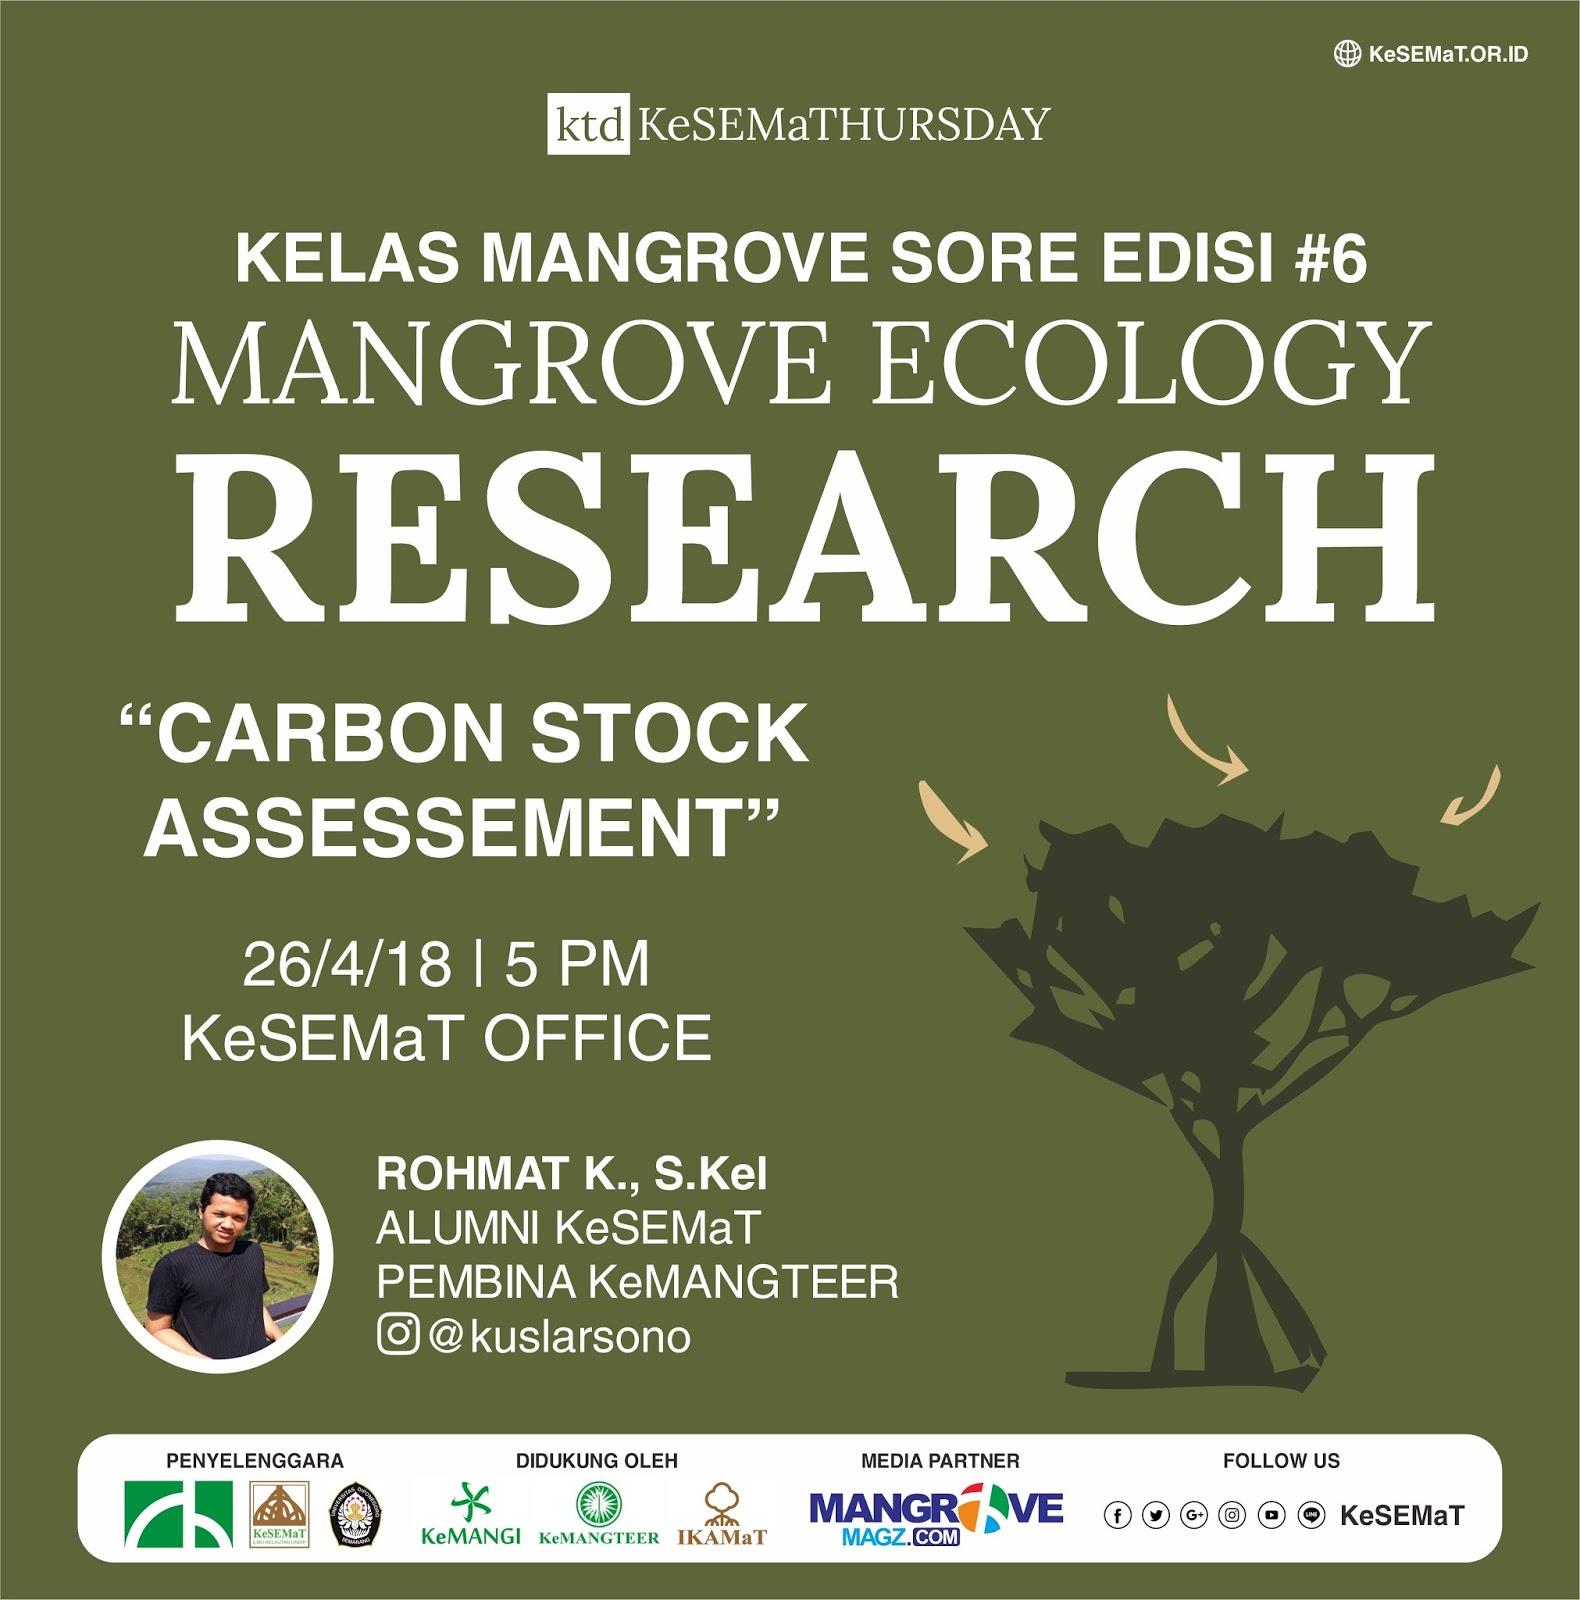 Kajian Mangrove dan Karbon di KTD Minggu Ini